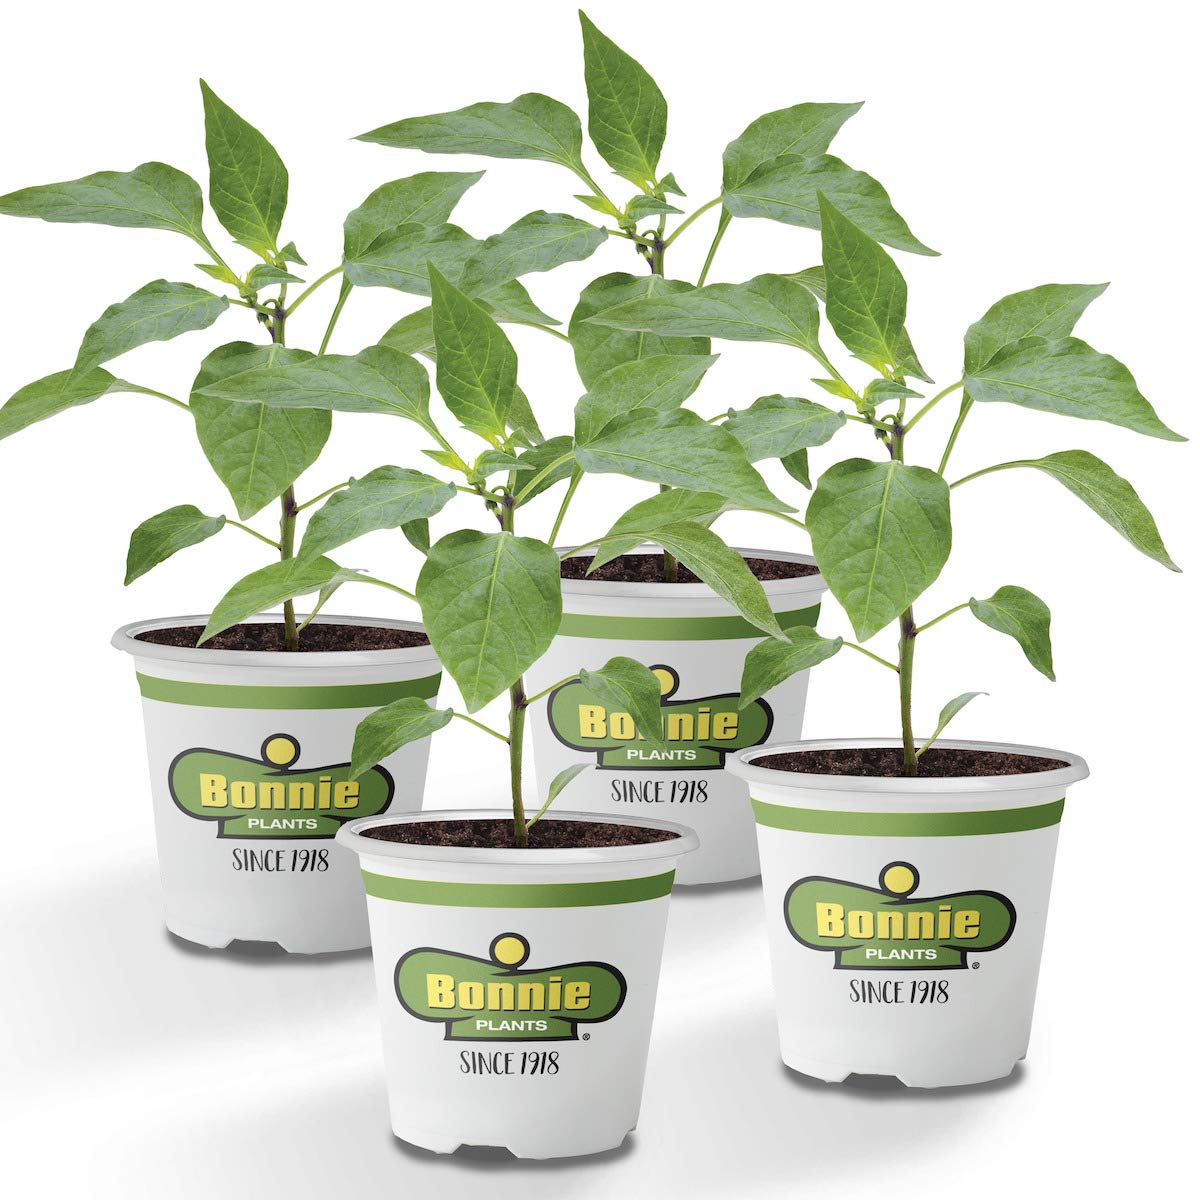 Bonnie Plants Bonnie's Green Bell Pepper Live Vegetable Plants - 4 Pack | Non-GMO | 2 - 3 Ft Plants | 4.5 x 4 Inch Pepper Size by Bonnie Plants (Image #1)